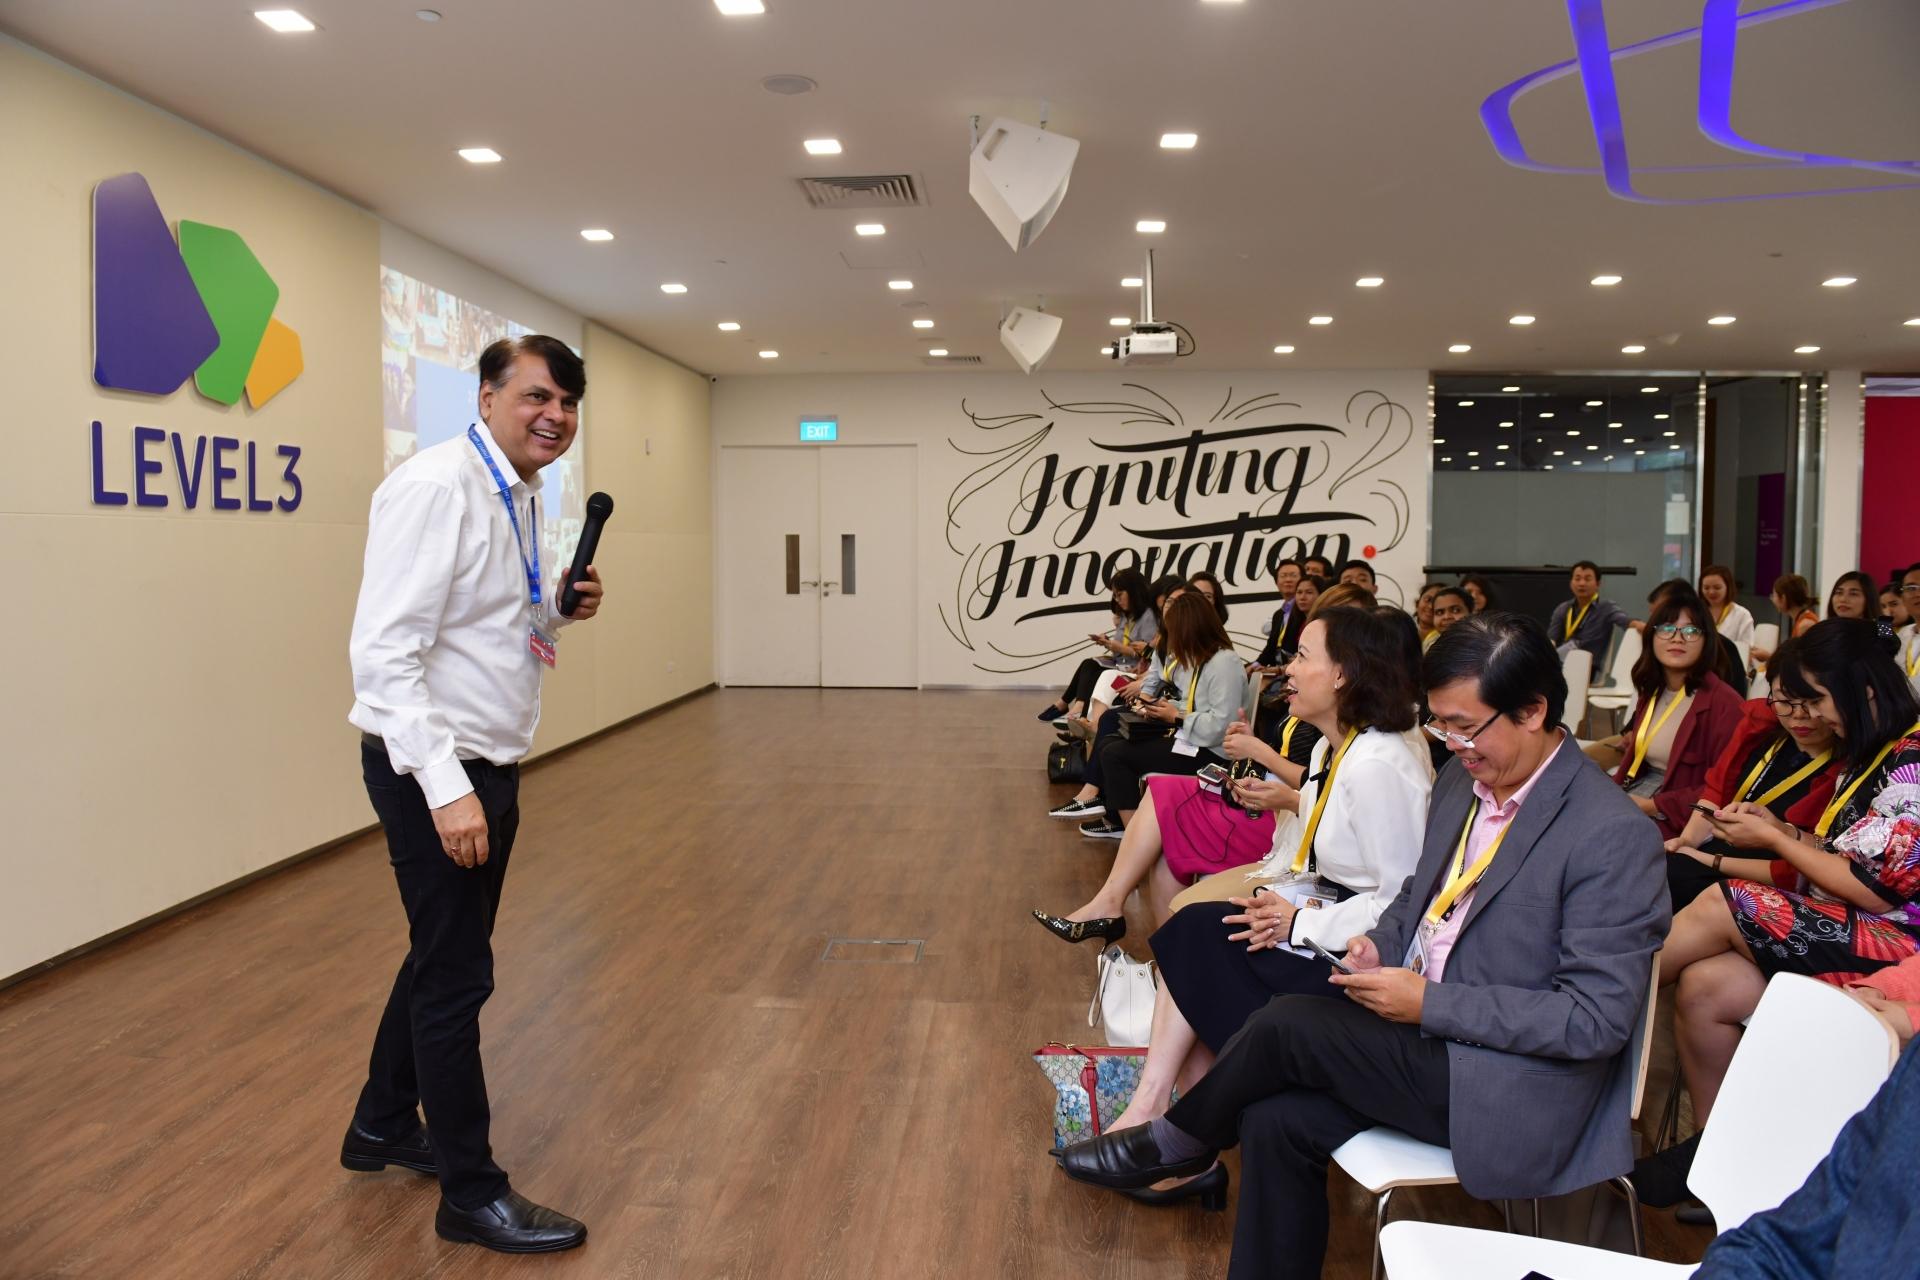 60 leaders join Talentnet Business Innovation Showcase 2019